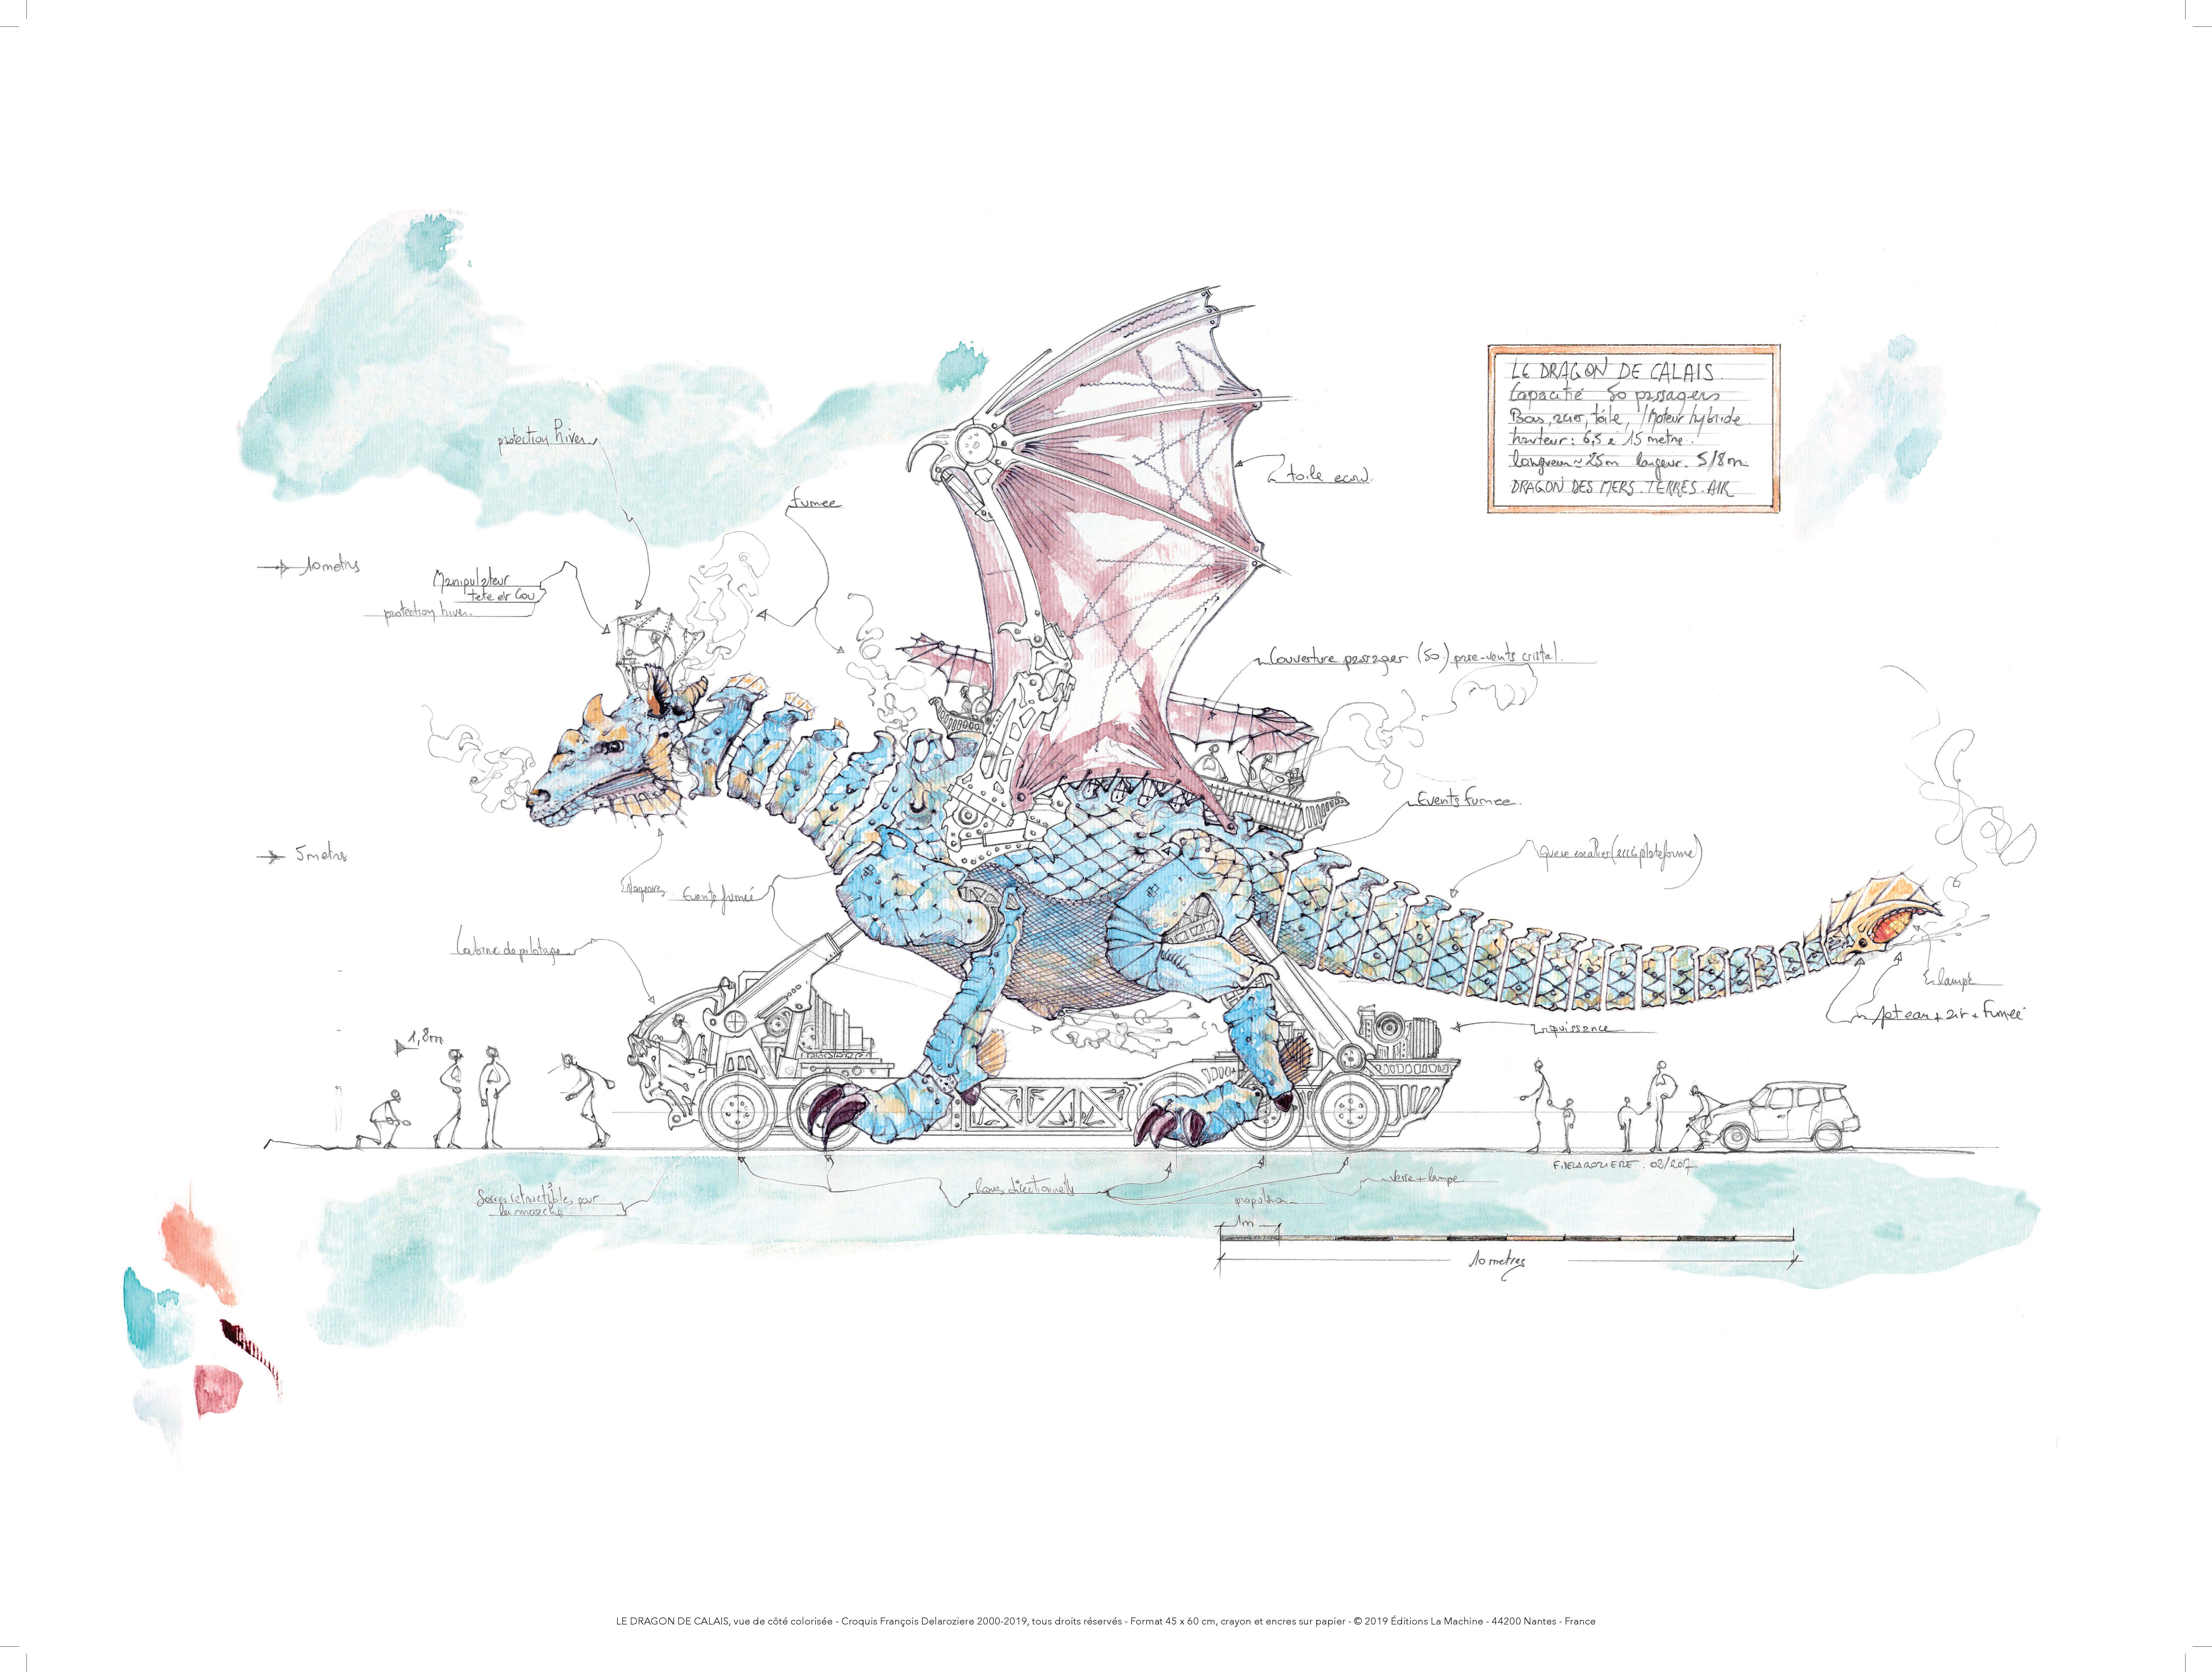 Le Dragon de Calais (c) Delaroziere